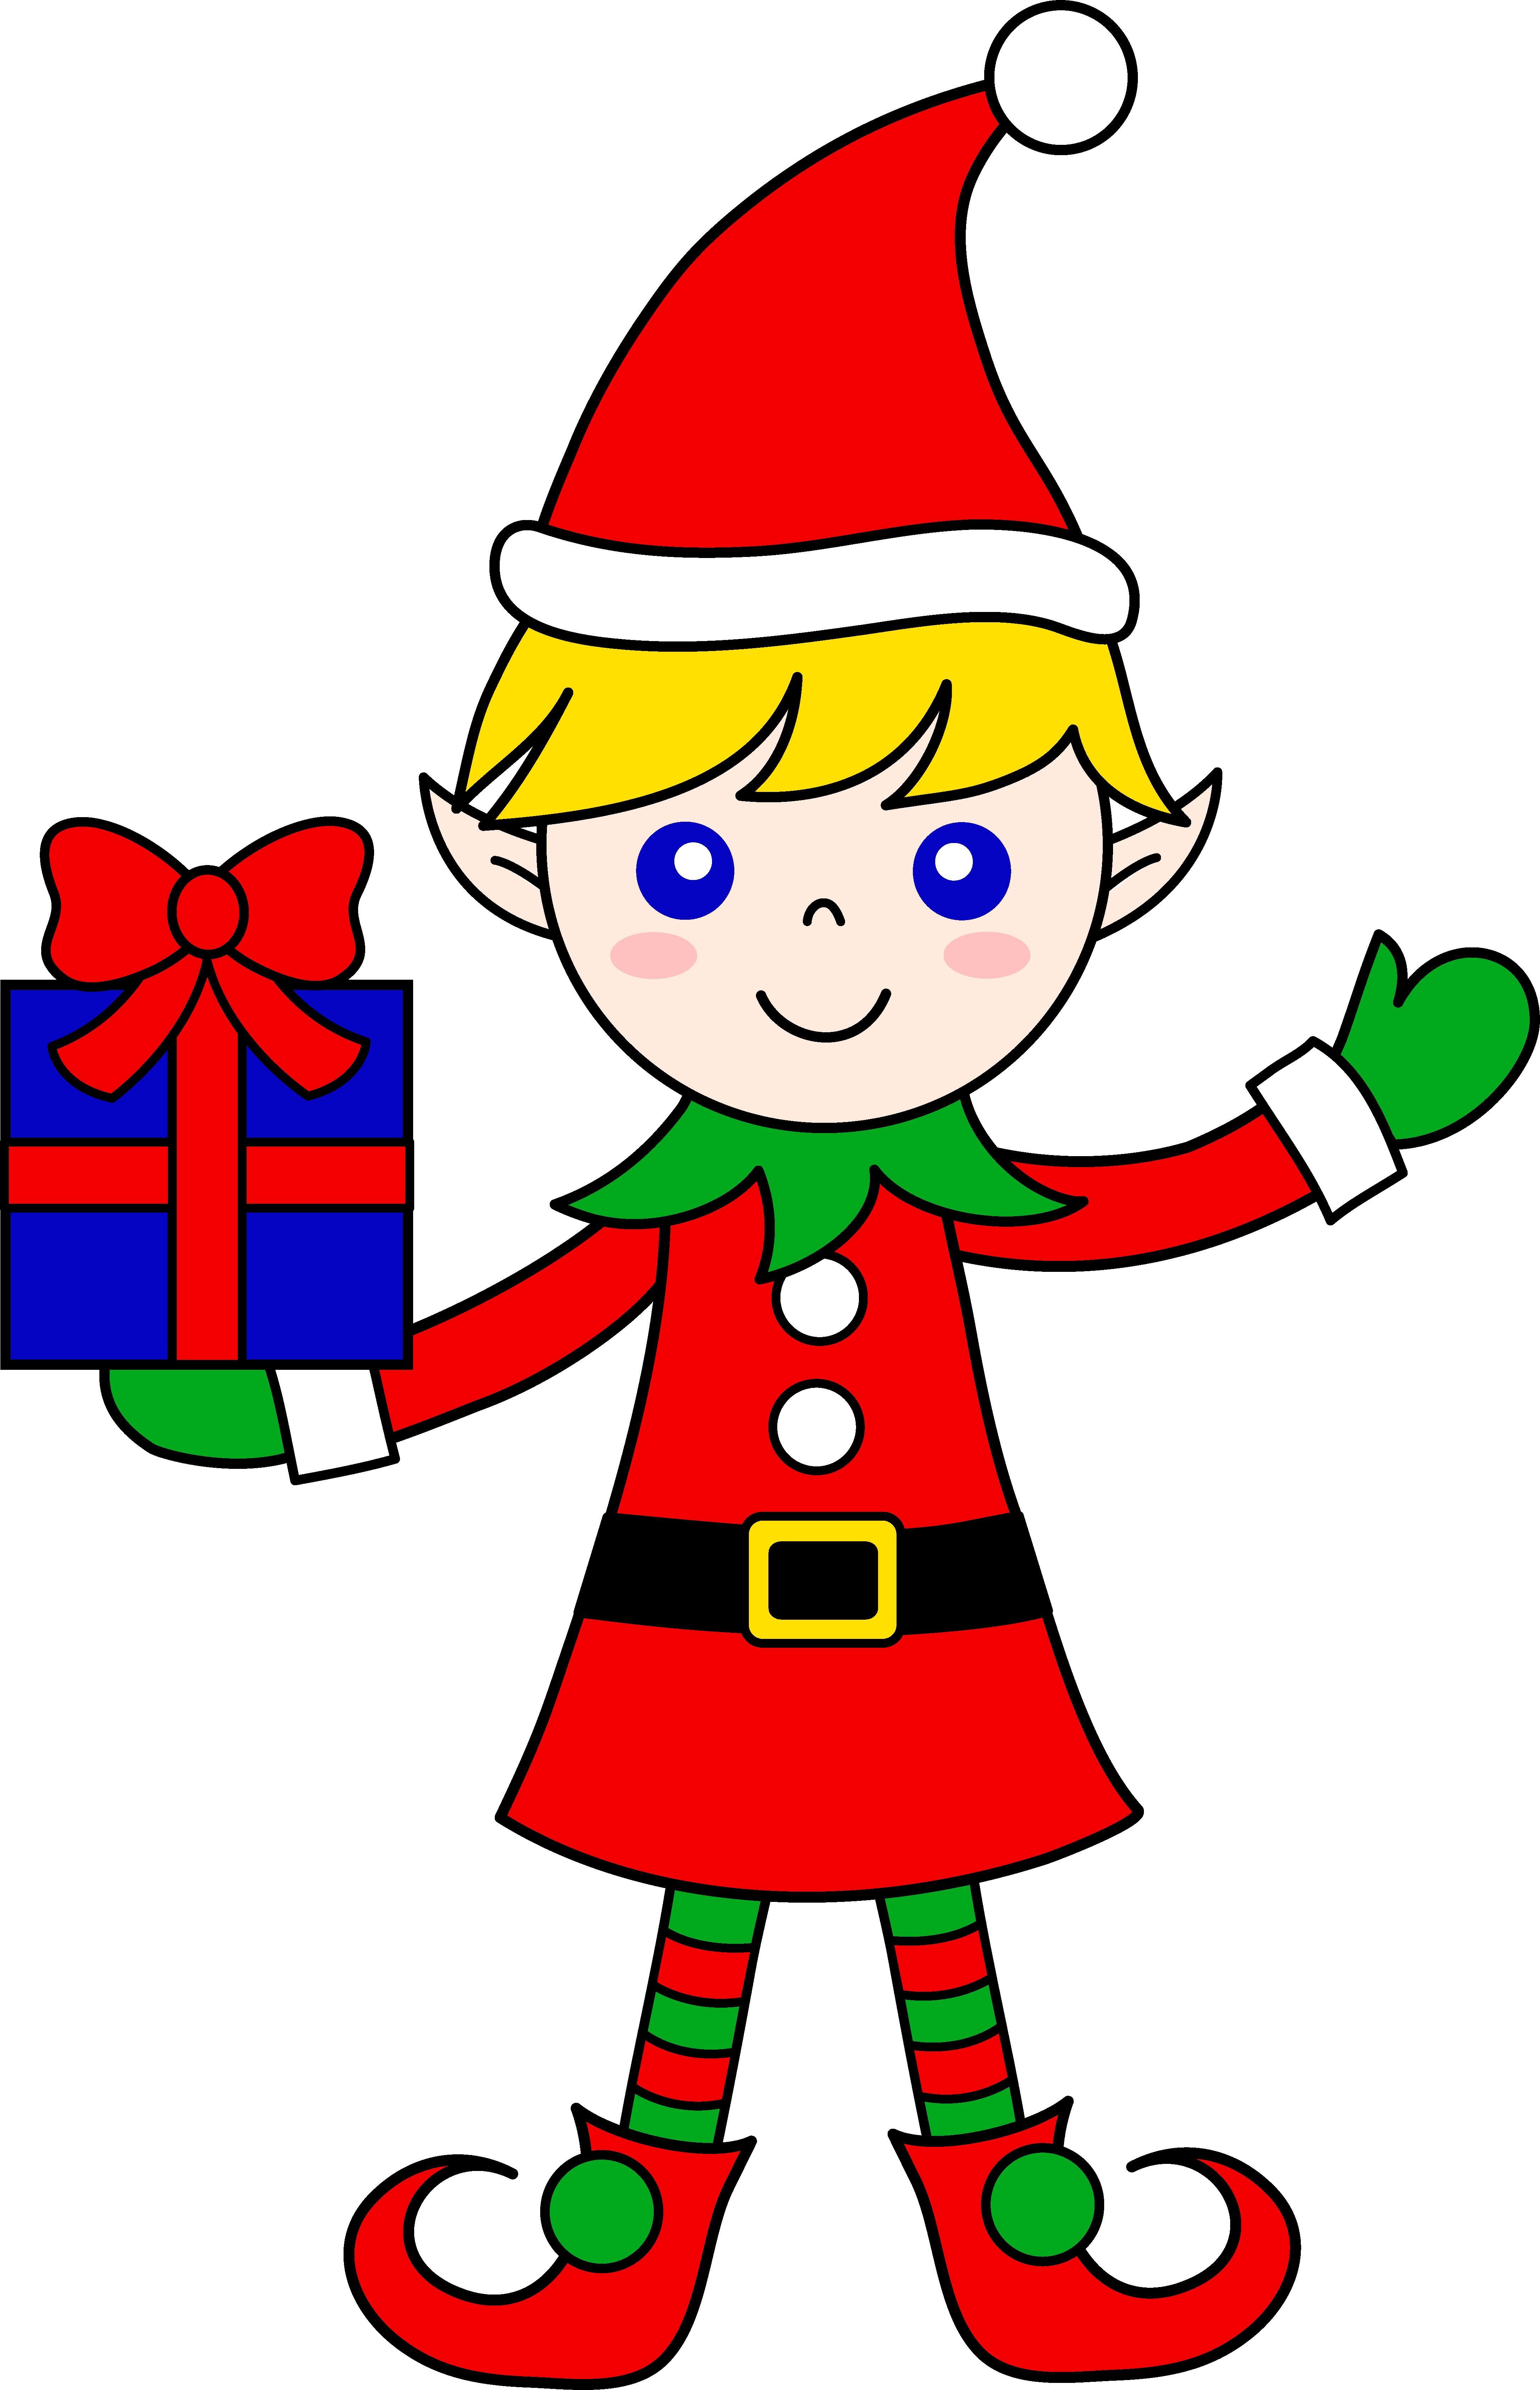 Cute Christmas Elf Clip Art-Cute Christmas Elf Clip Art-16